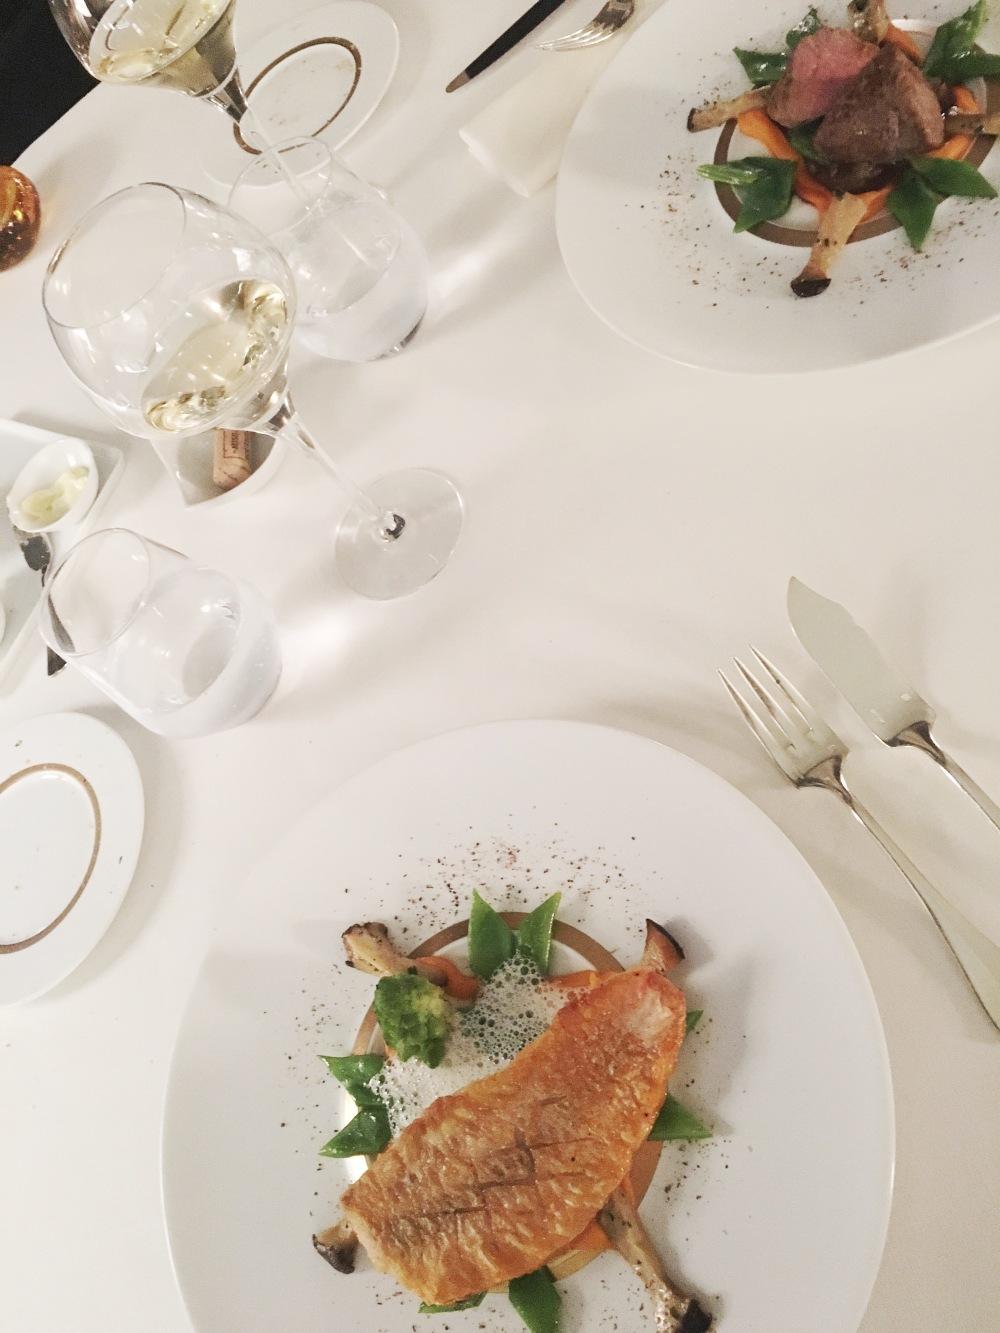 hoteldesbains,roberville,samuelblanc,gastronomie,restaurant,menugastro,fashionblogger,belgian,blogger,blogmode,belgiumblogger,photographie,food,healthy, bio,menu,étoilé